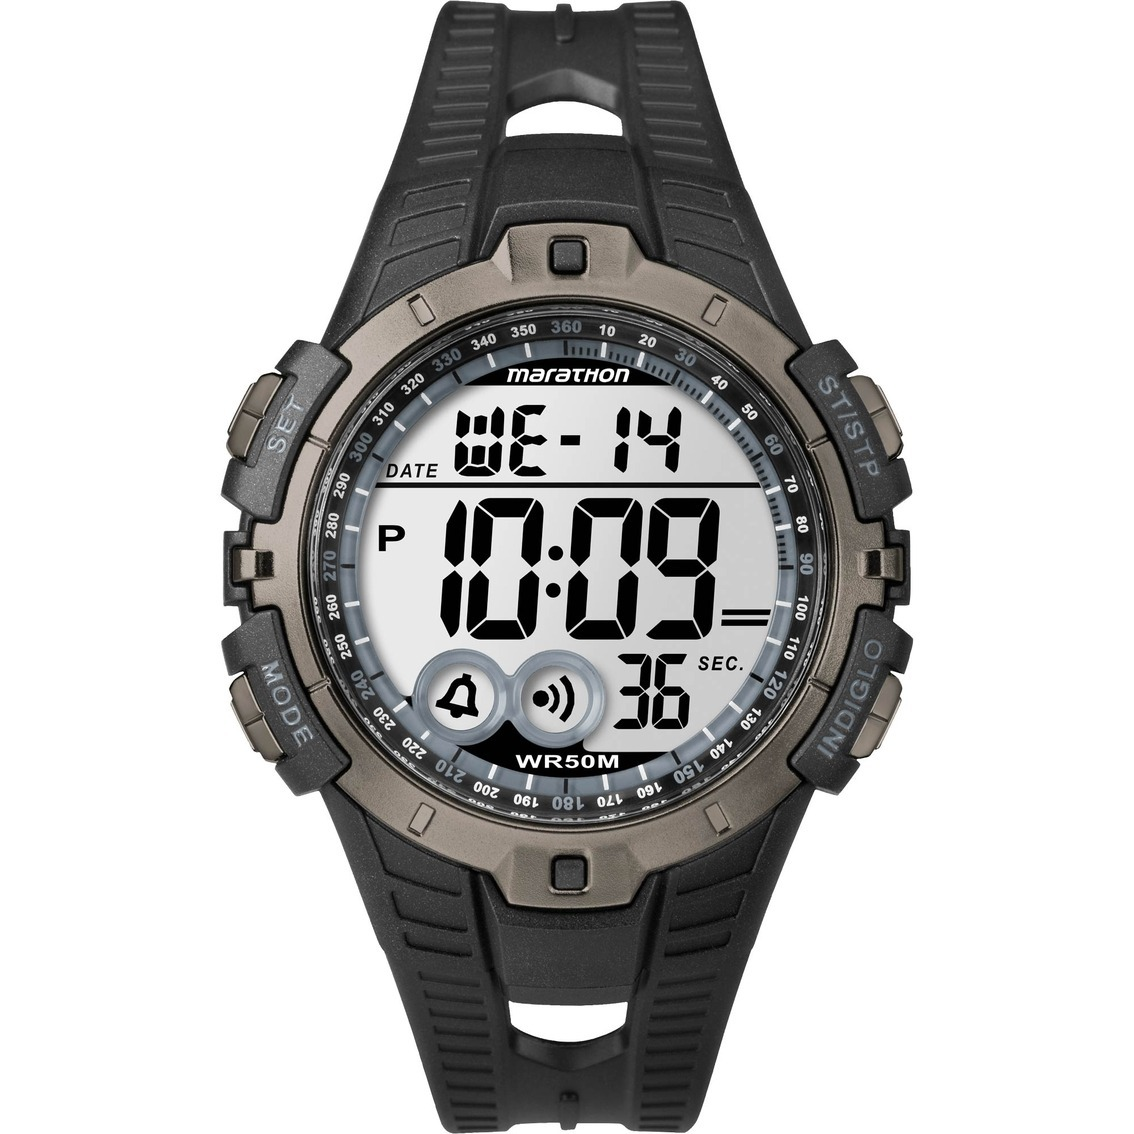 de05758c9deef Relógio Marathon - Timex Digital Masculino T5k802ww tn - R  159